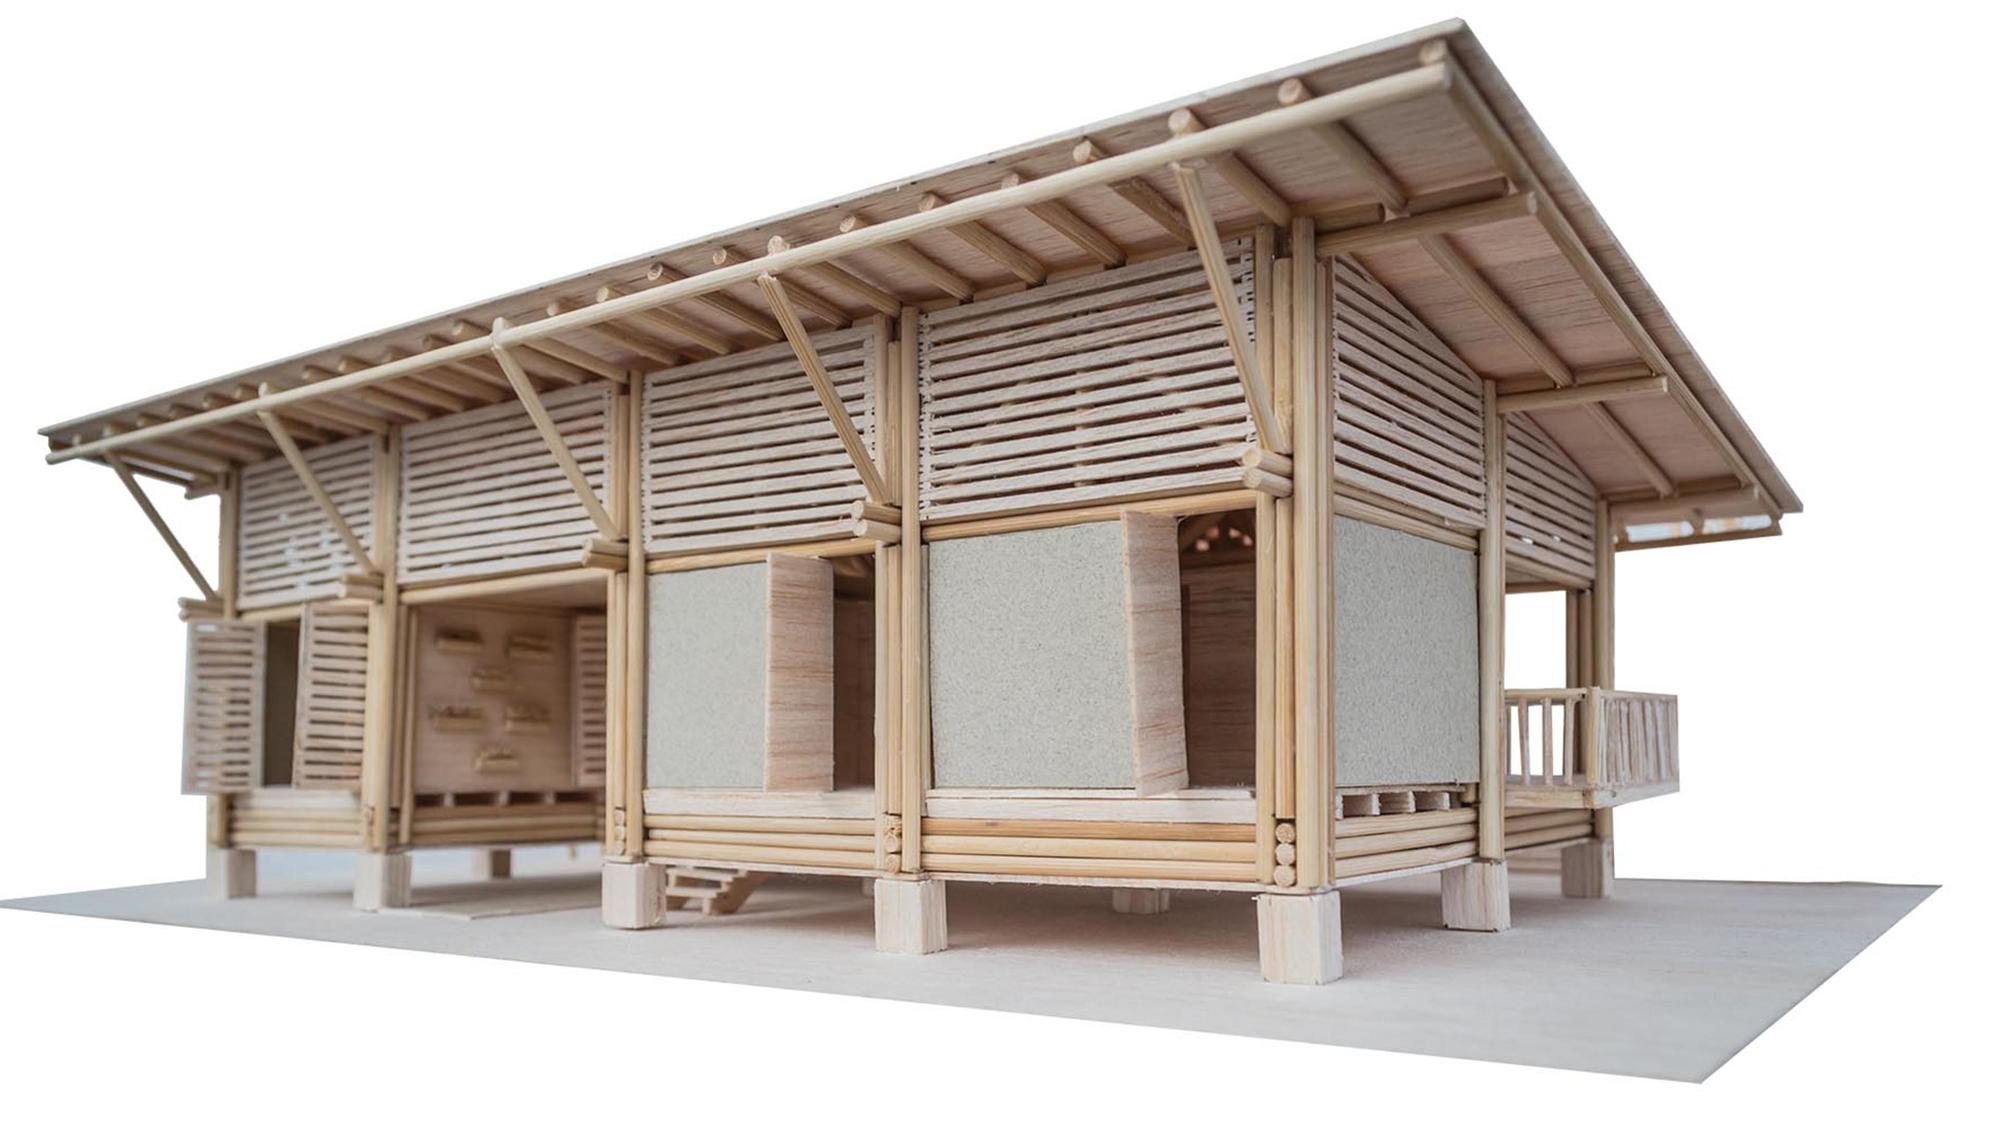 Bamboo Brilliance Bamboo Casa Covento By Architect - Bamboo Hut PNG